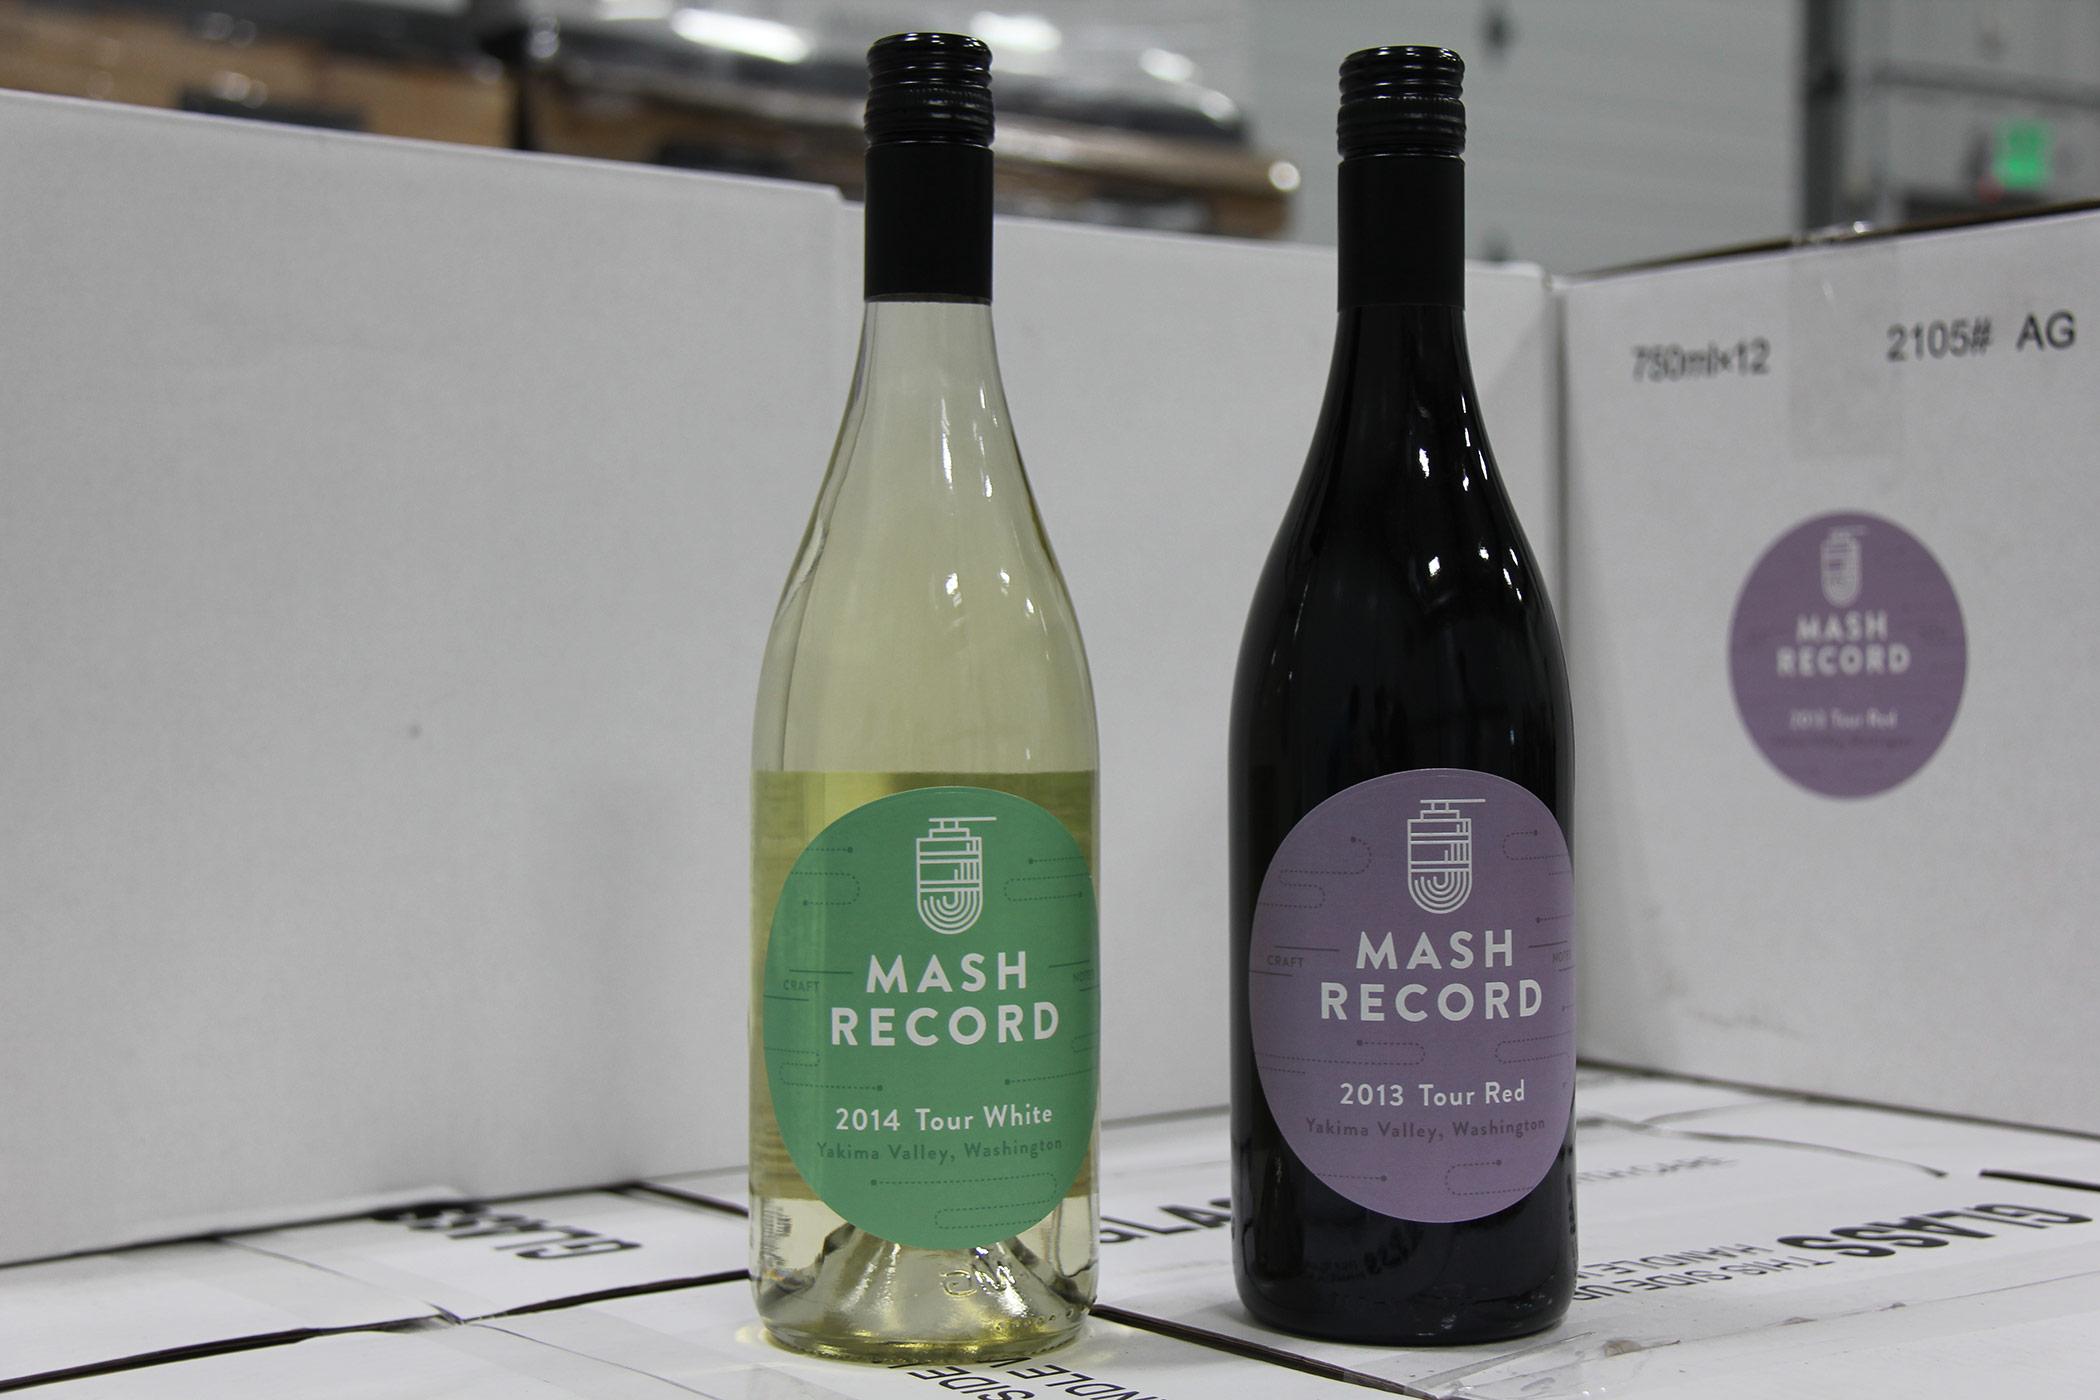 Mash Record Wines